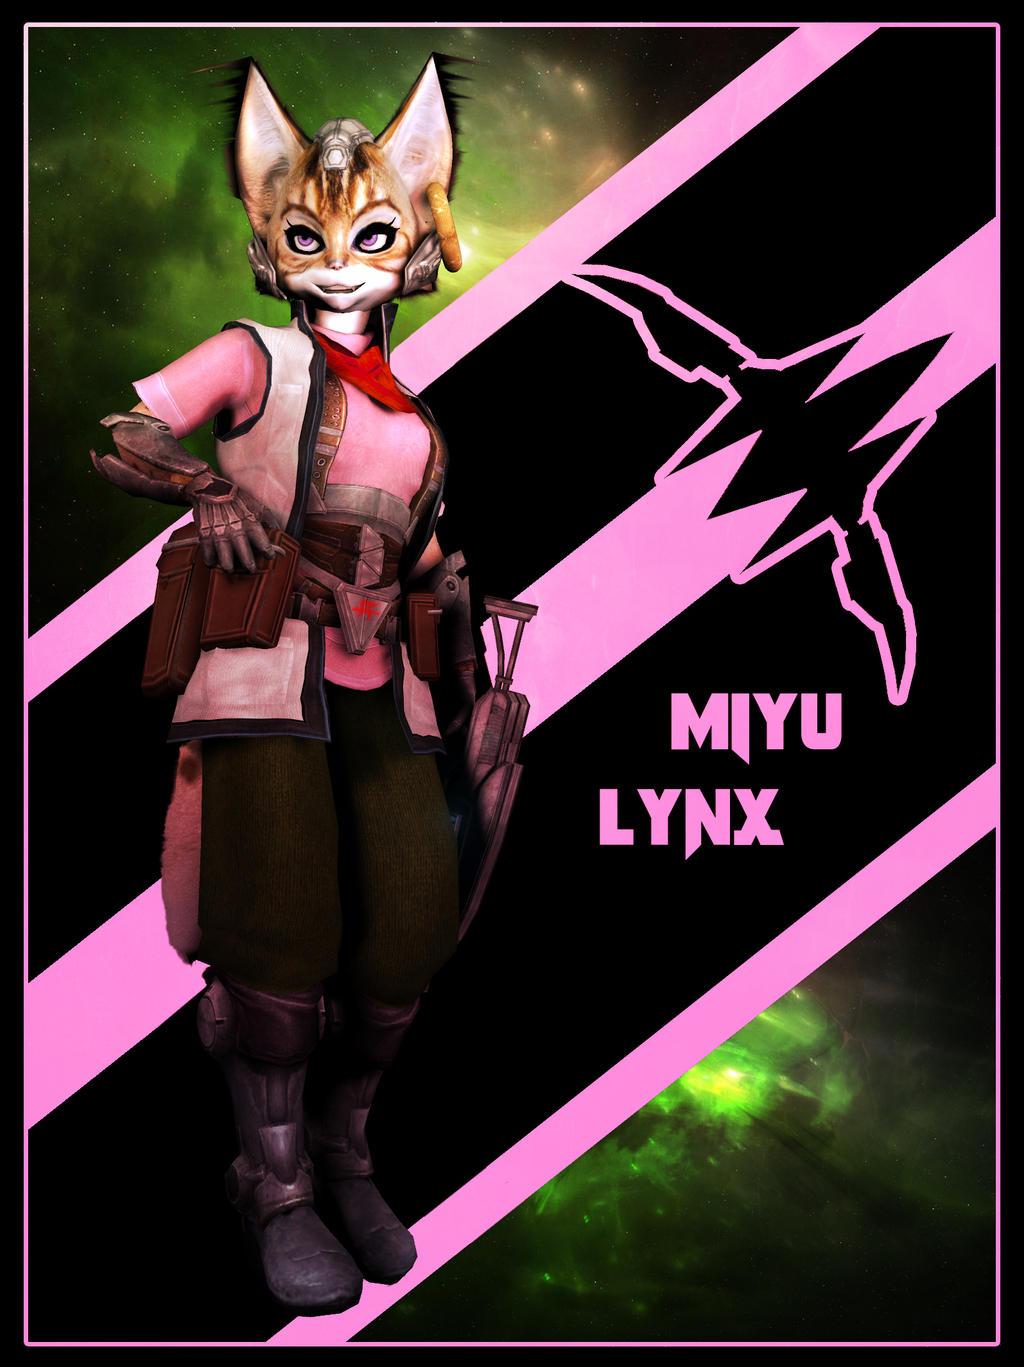 miyu_lynx_by_undyingnephalim-d8kfwfz.jpg